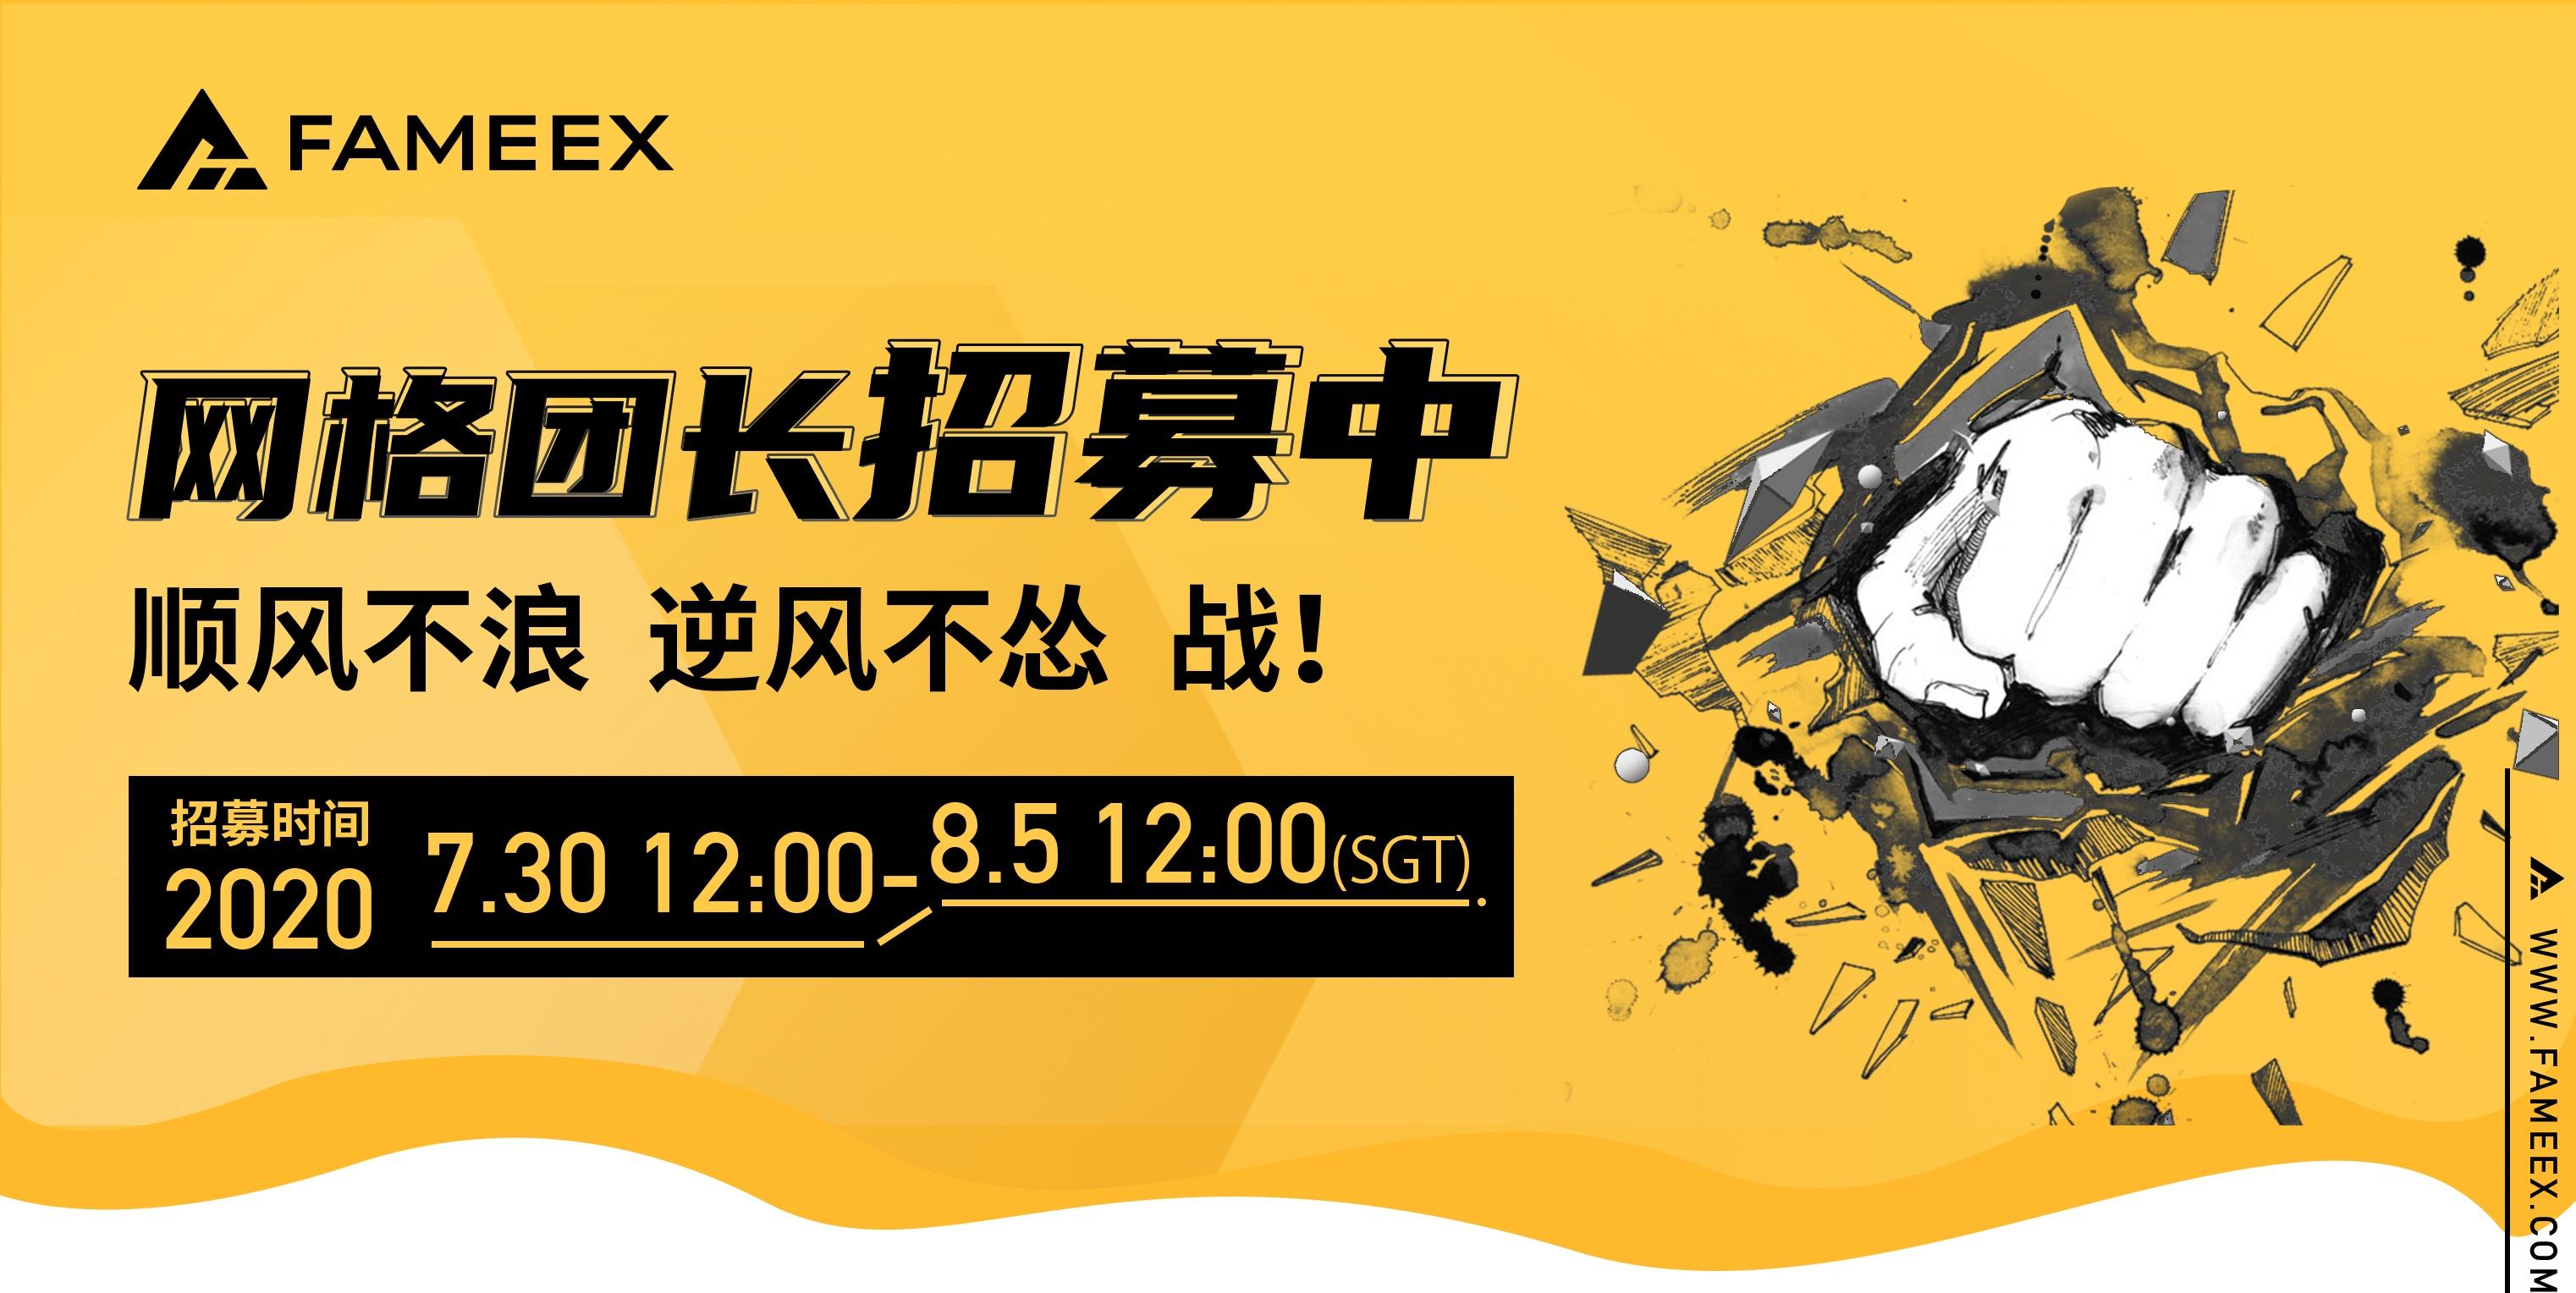 FAMEEX网格交易团队赛 18 ETH 大放送